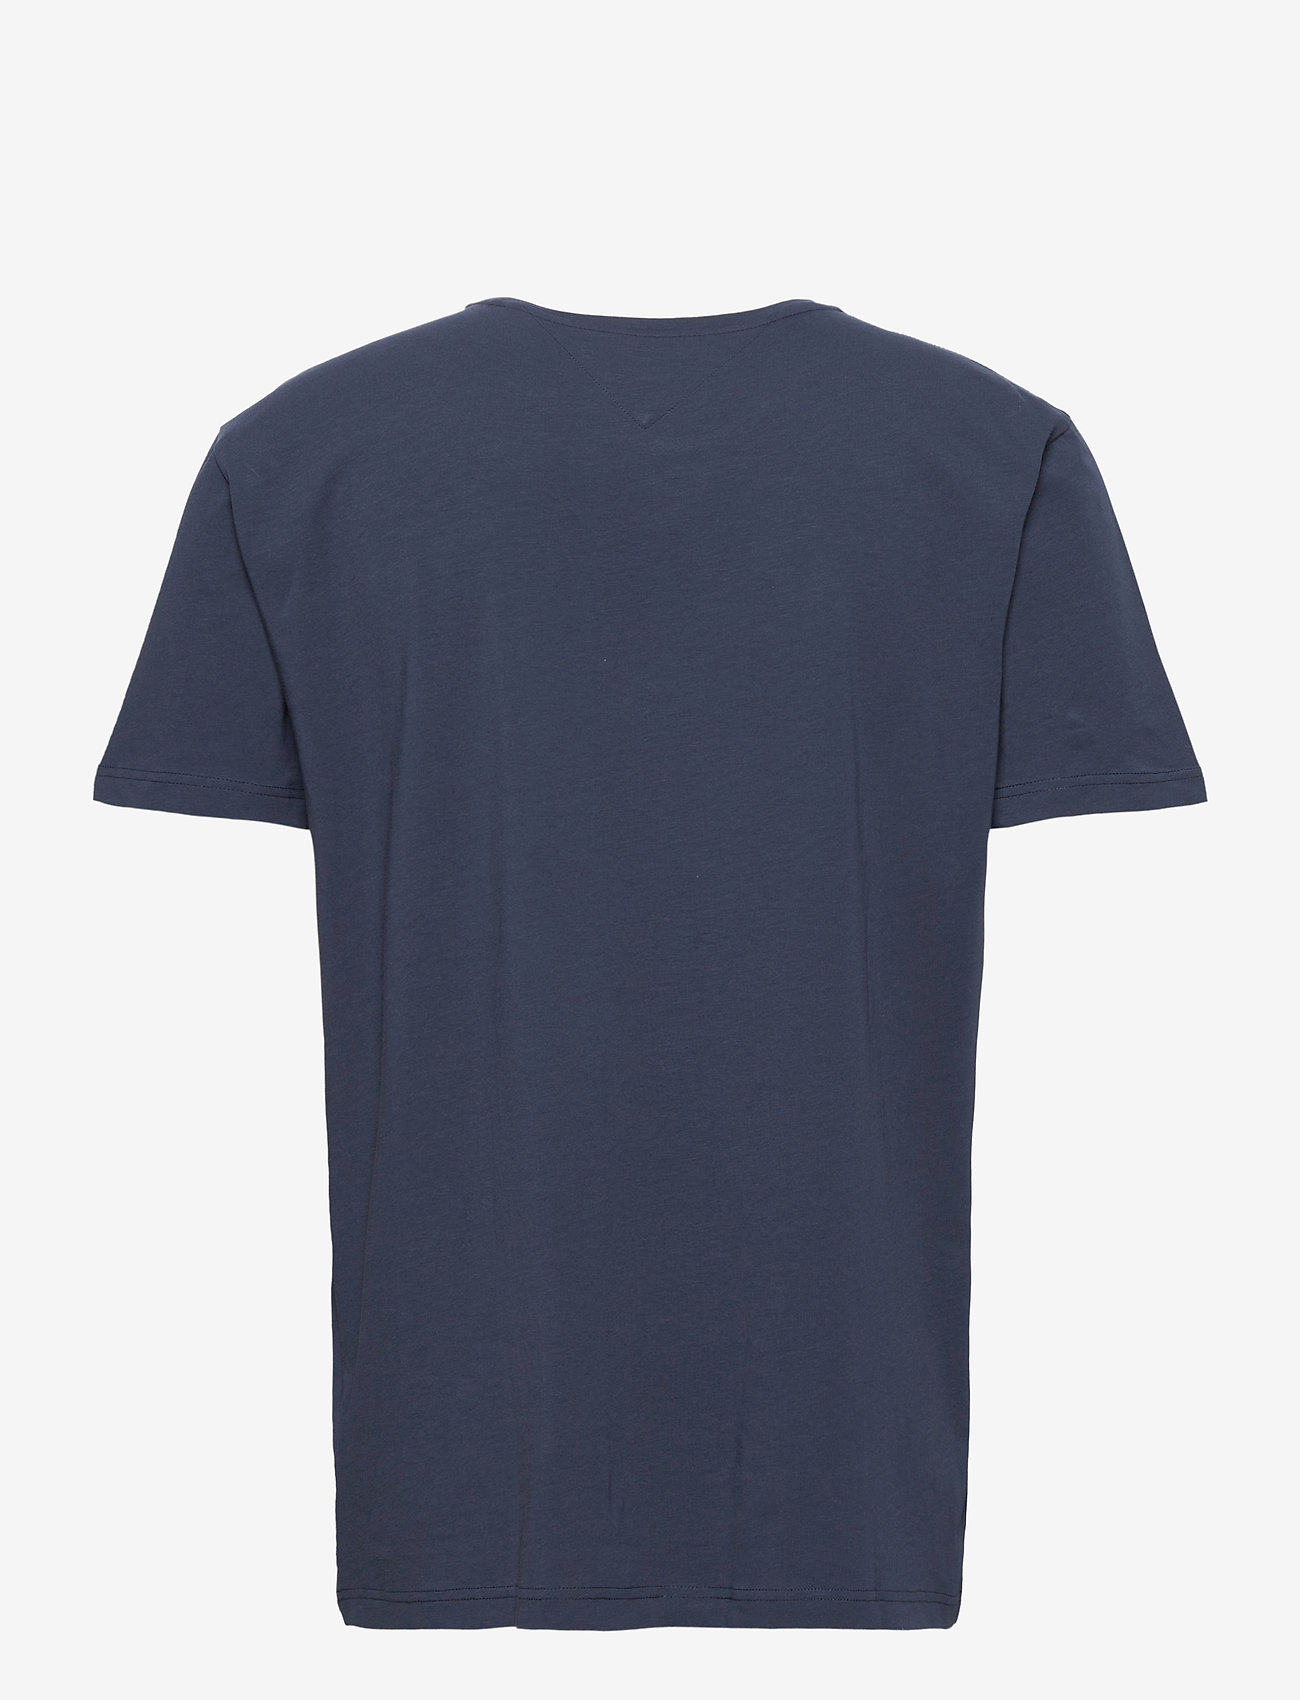 Tommy Hilfiger - CORE STRETCH SLIM CNECK TEE - t-shirts basiques - navy blazer - 1